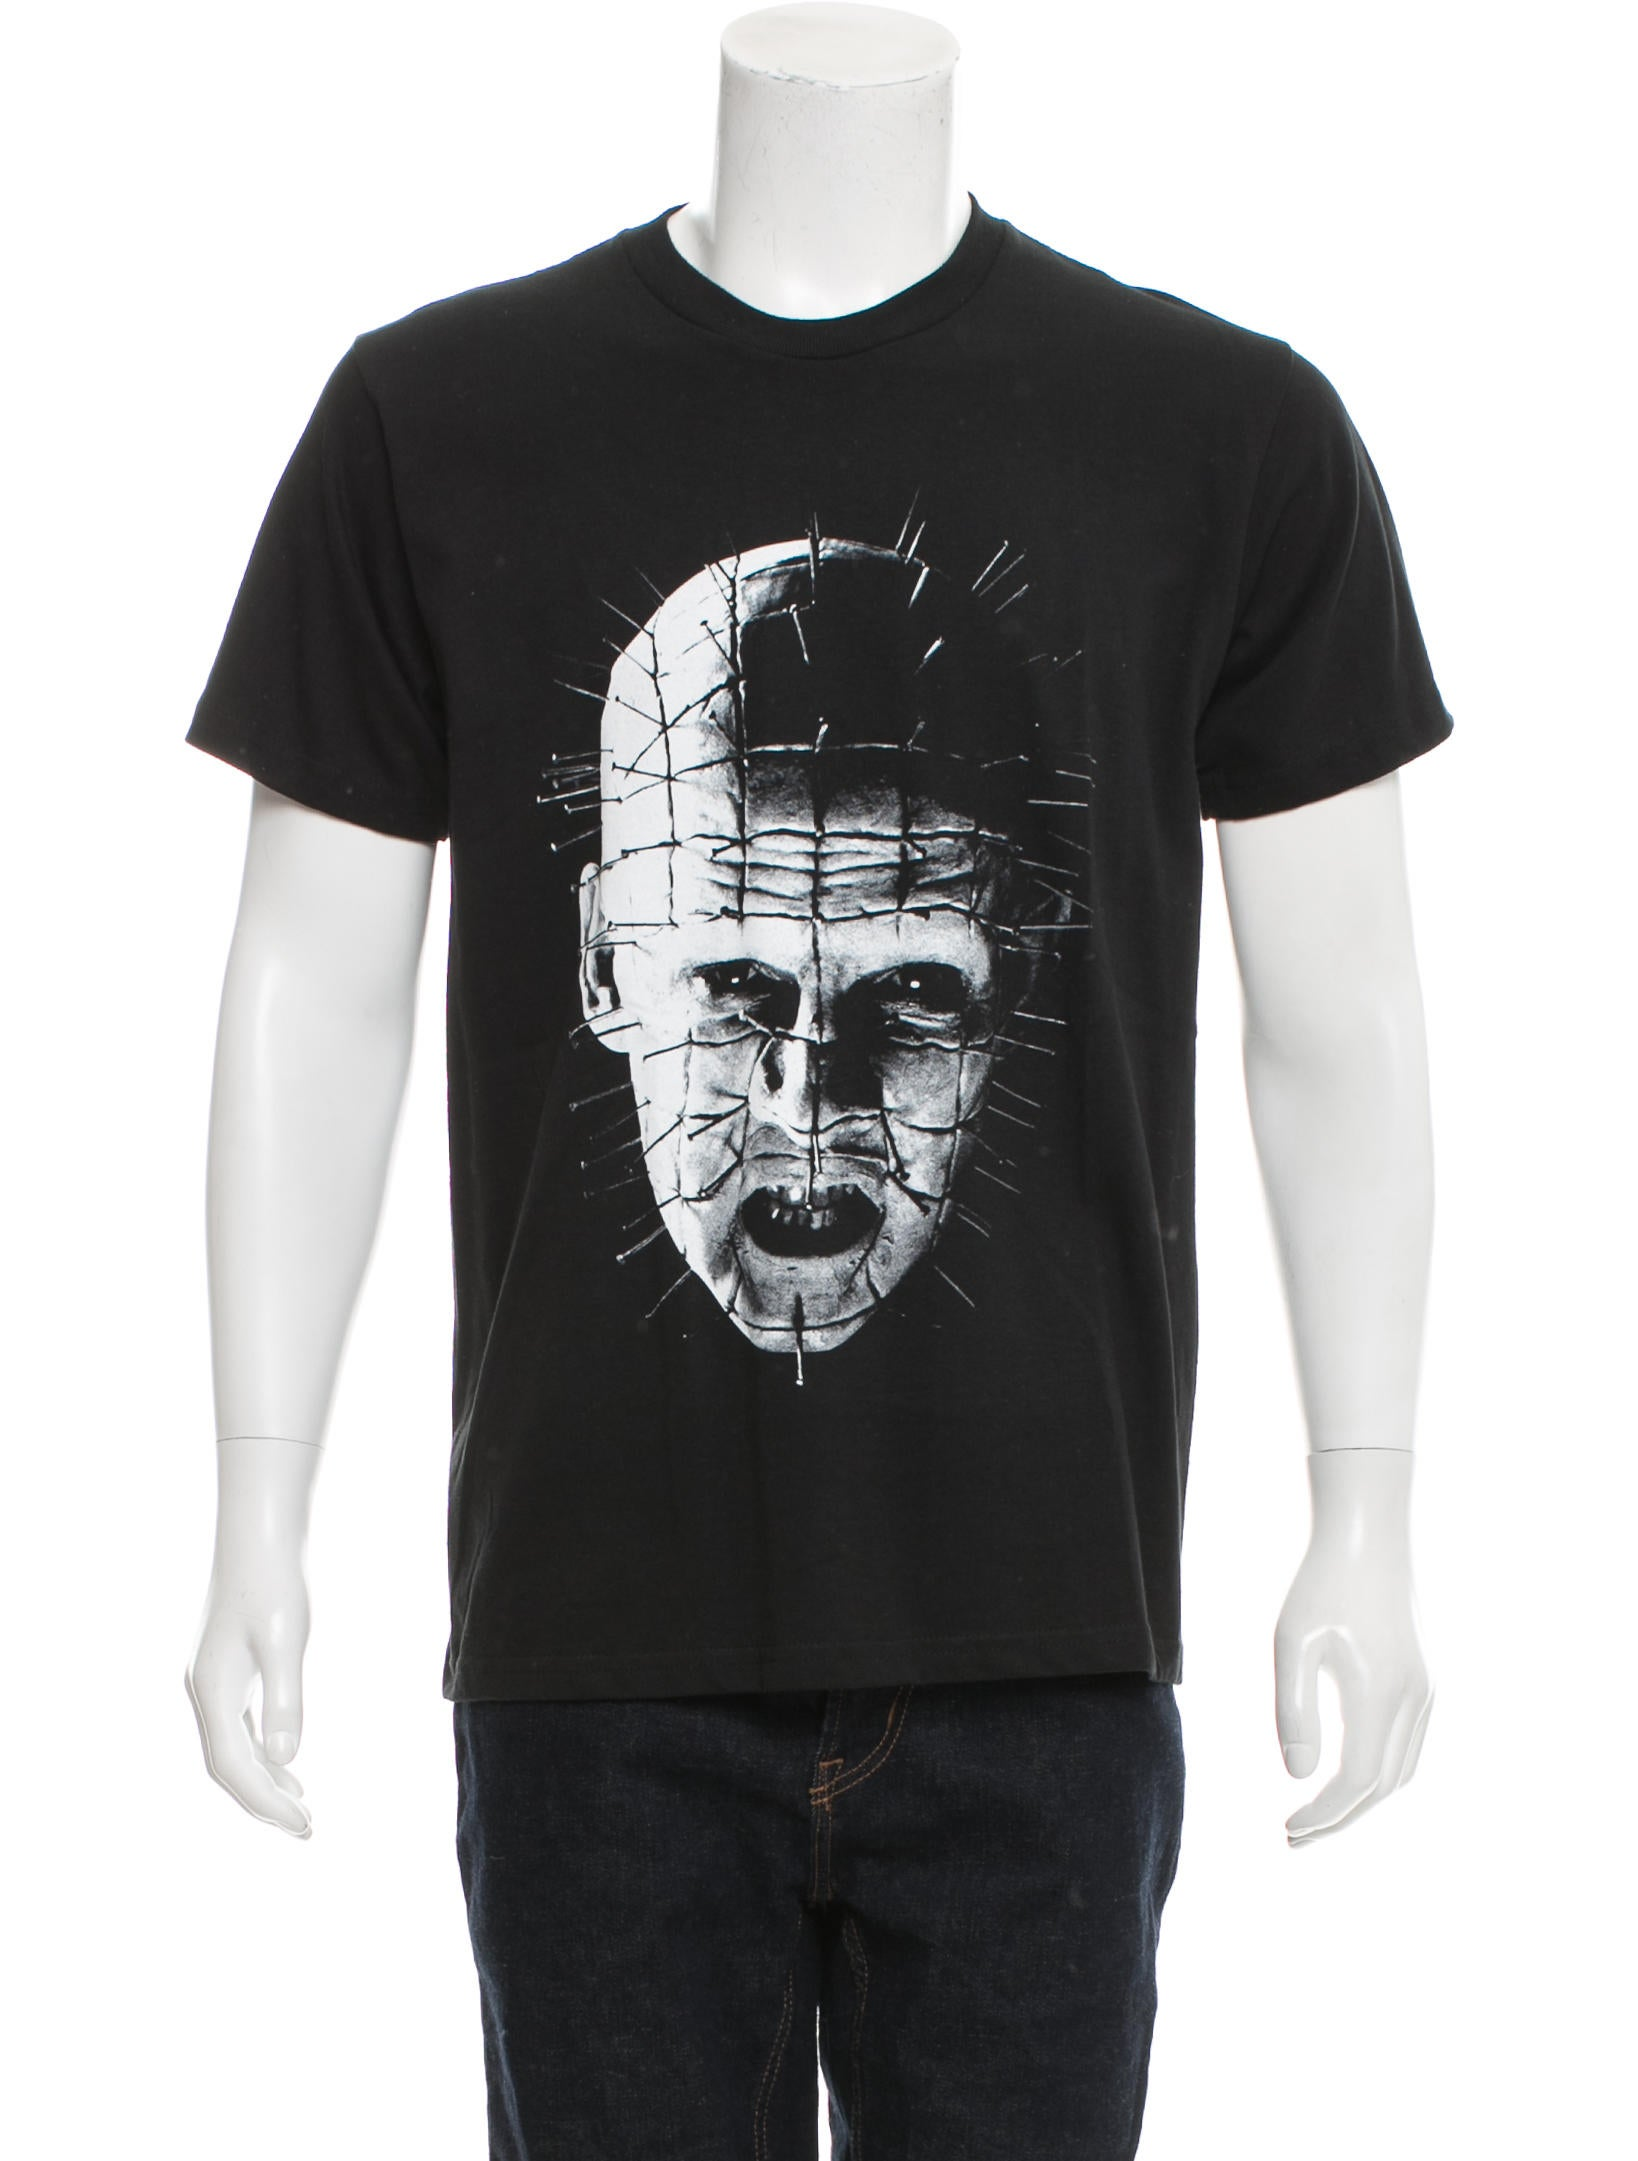 05c0e80bfd68 Supreme 2018 Hellraiser Pinhead T-Shirt - Clothing - WSPME22175 ...